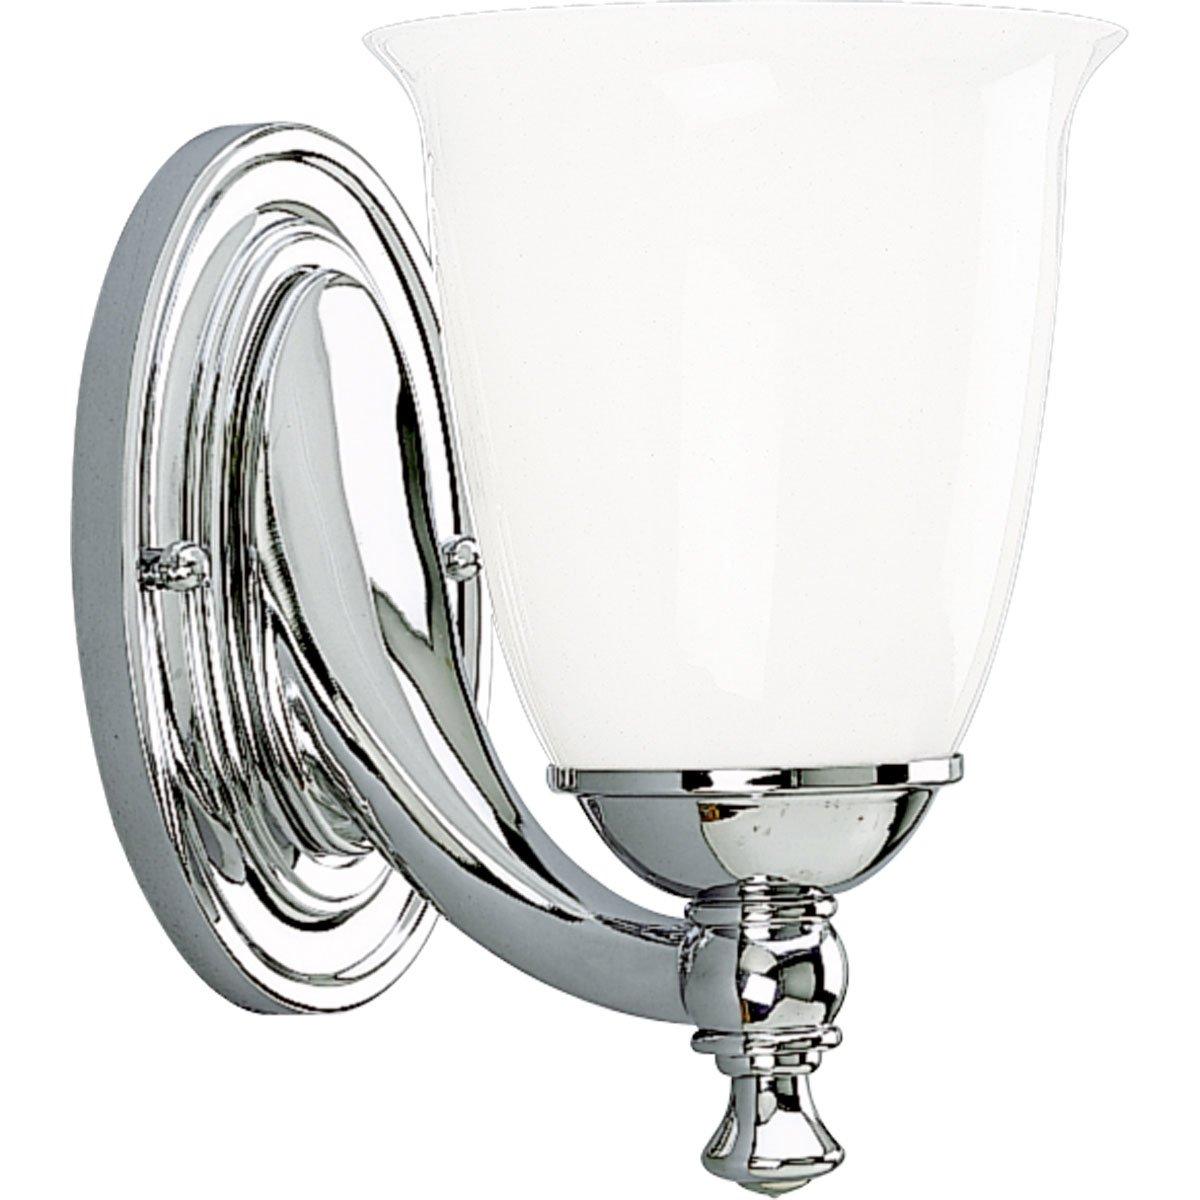 Progress Lighting P3027-15 1-Light Bath Bracket with White Opal Glass, Polished Chrome by Progress Lighting